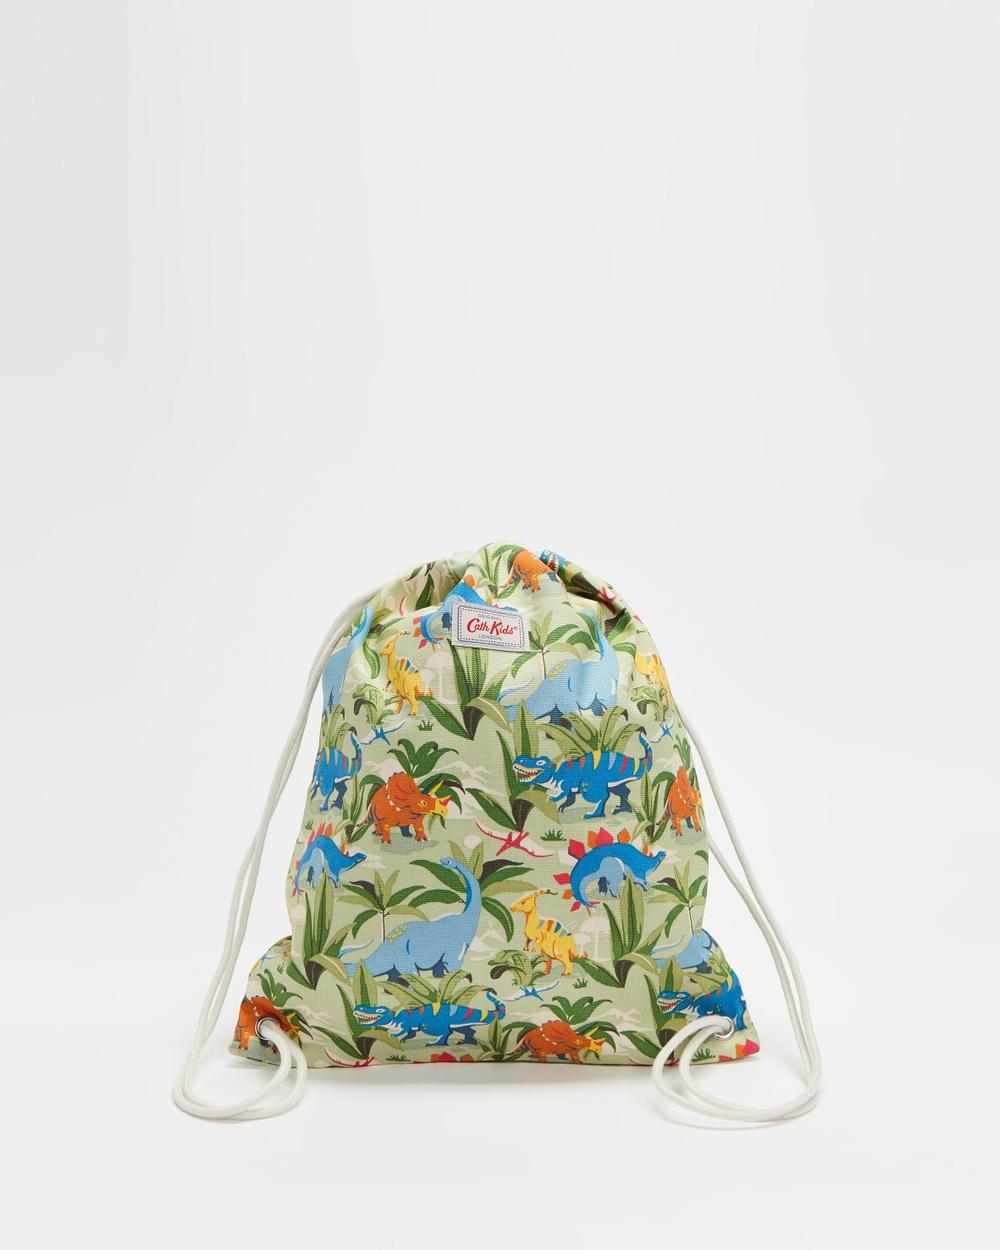 Cath Kidston Drawstring Bag Kids Backpacks Dinosaur Jungle